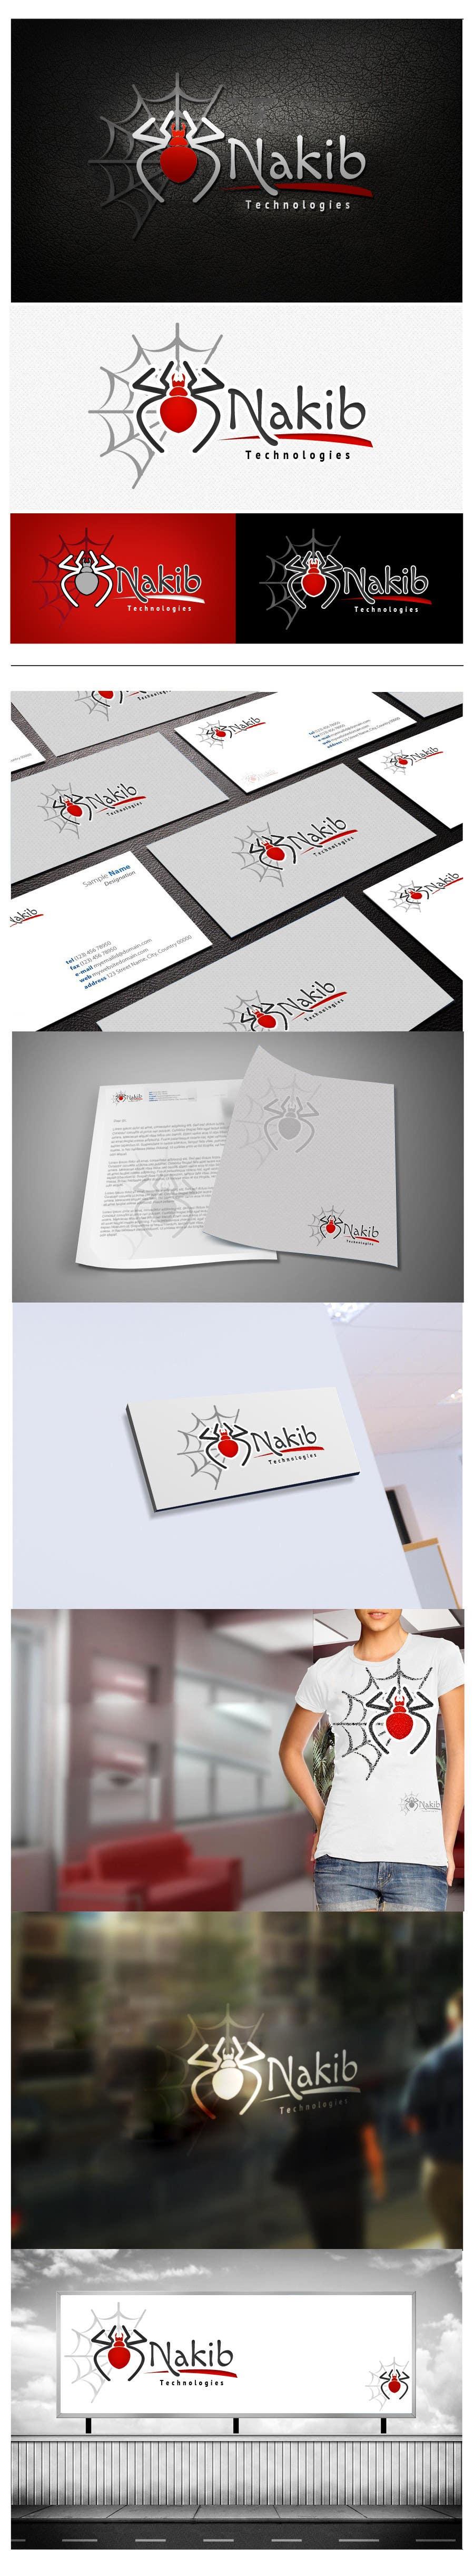 Kilpailutyö #66 kilpailussa Develop a Corporate Identity for 3nkaib Technologies (Spiders)